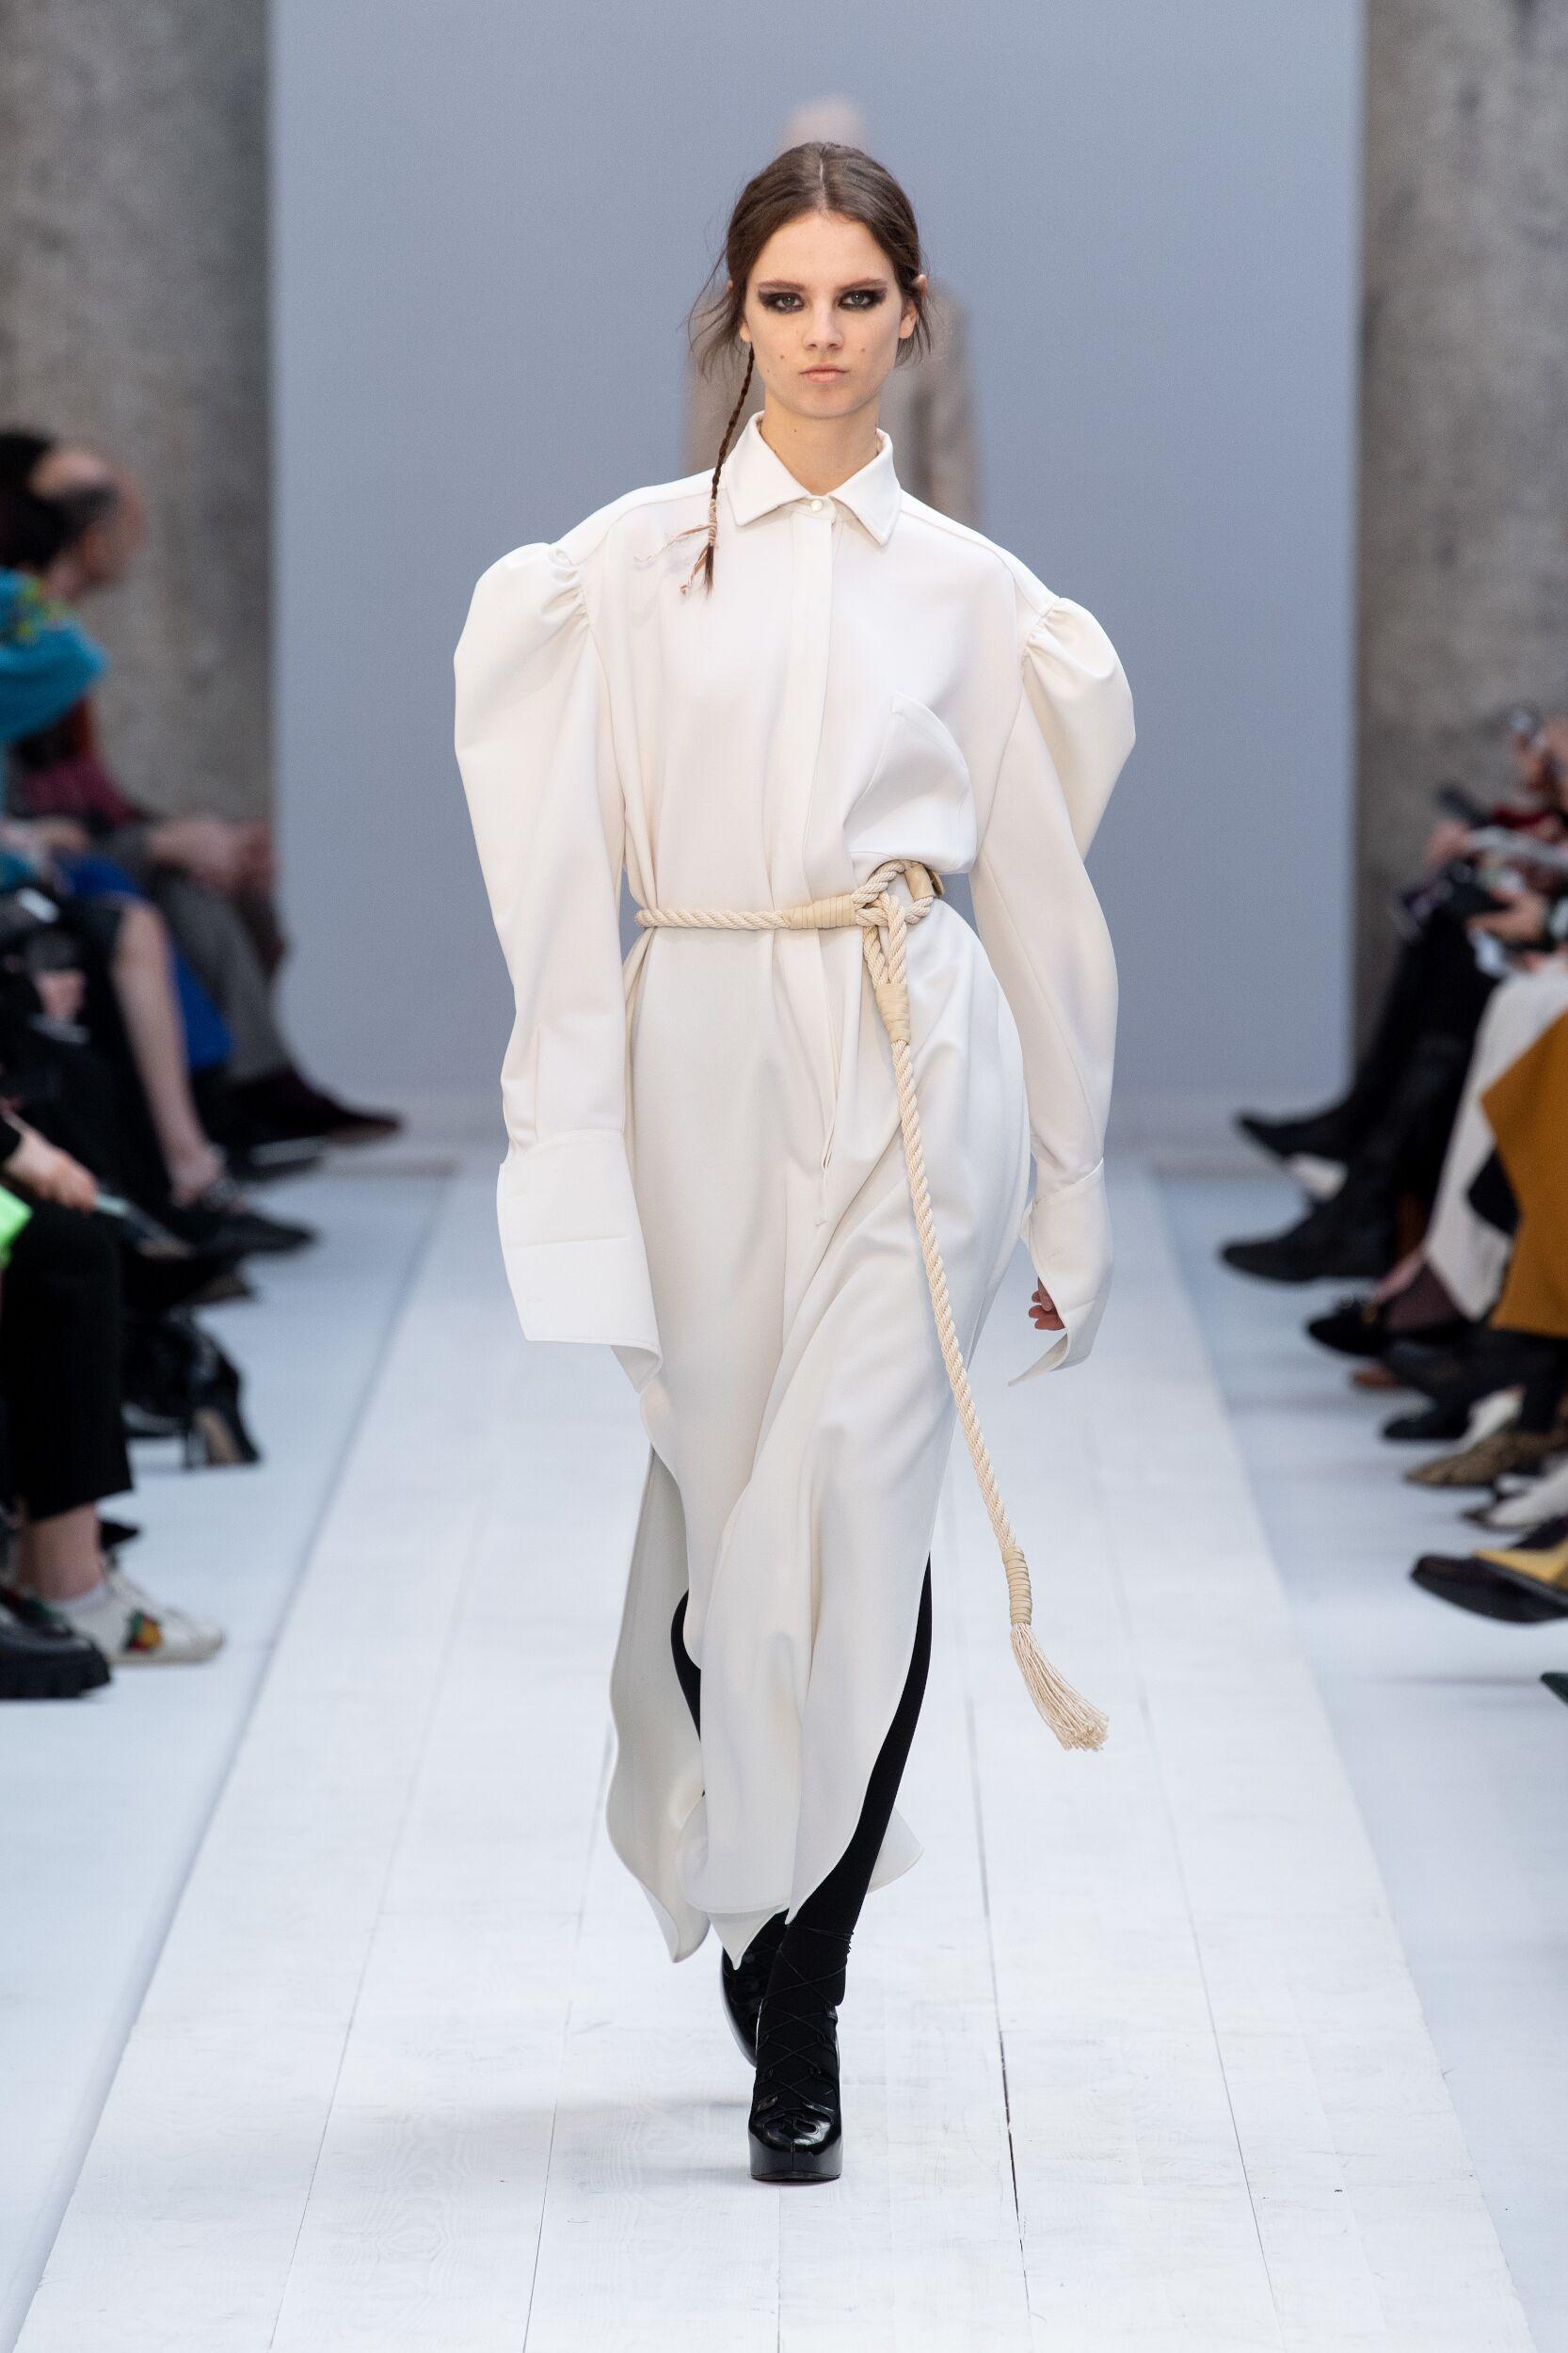 2020 Catwalk Max Mara Woman Fashion Show Winter